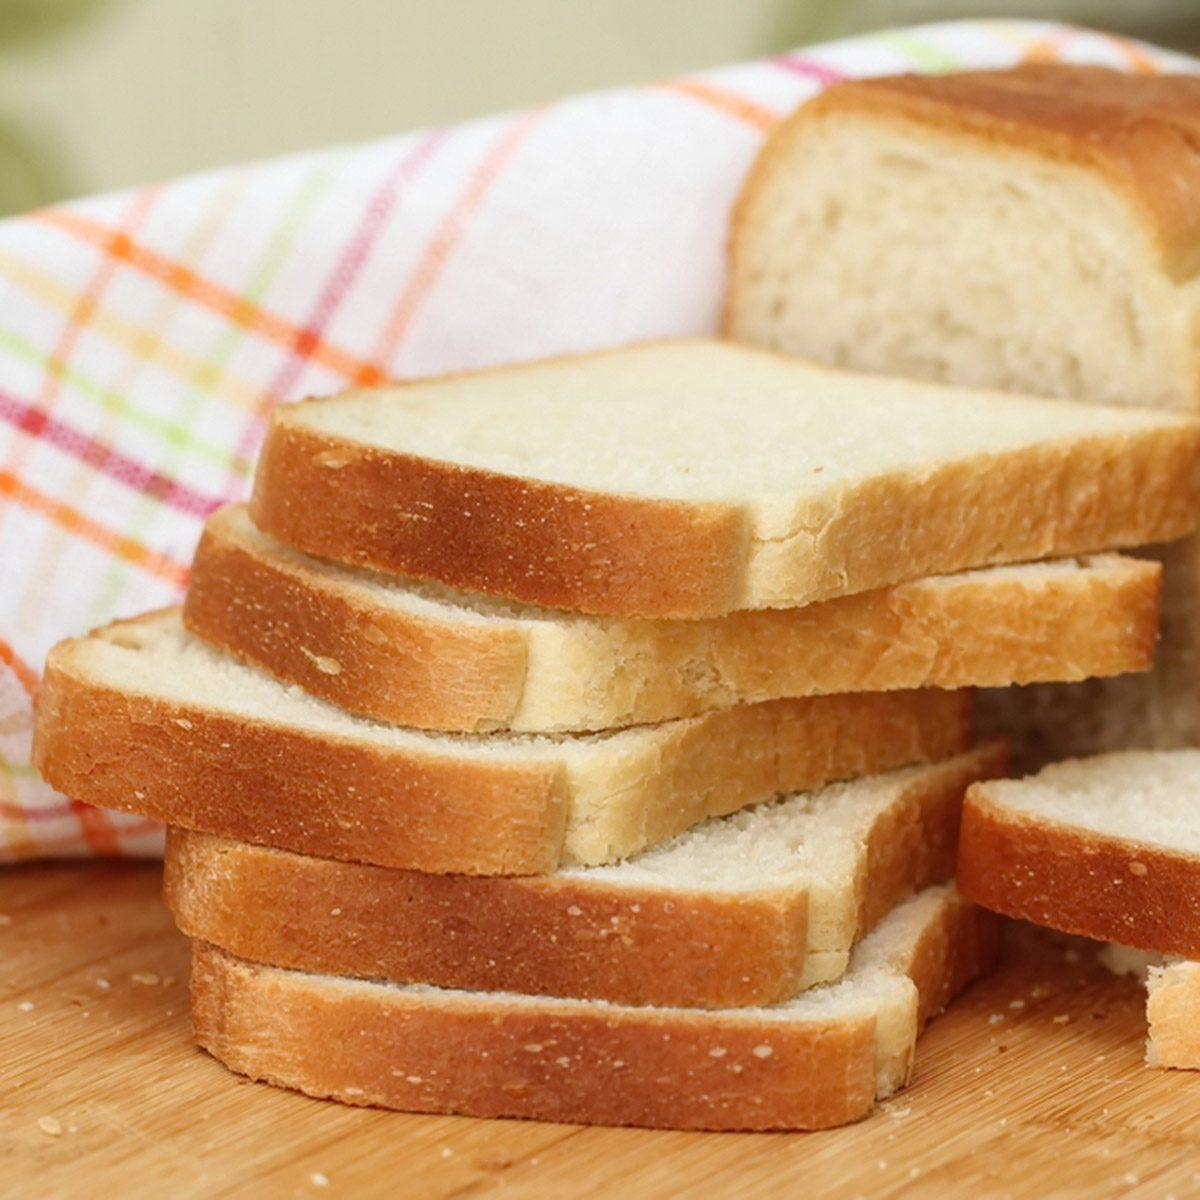 Sliced white bread; Shutterstock ID 352819853